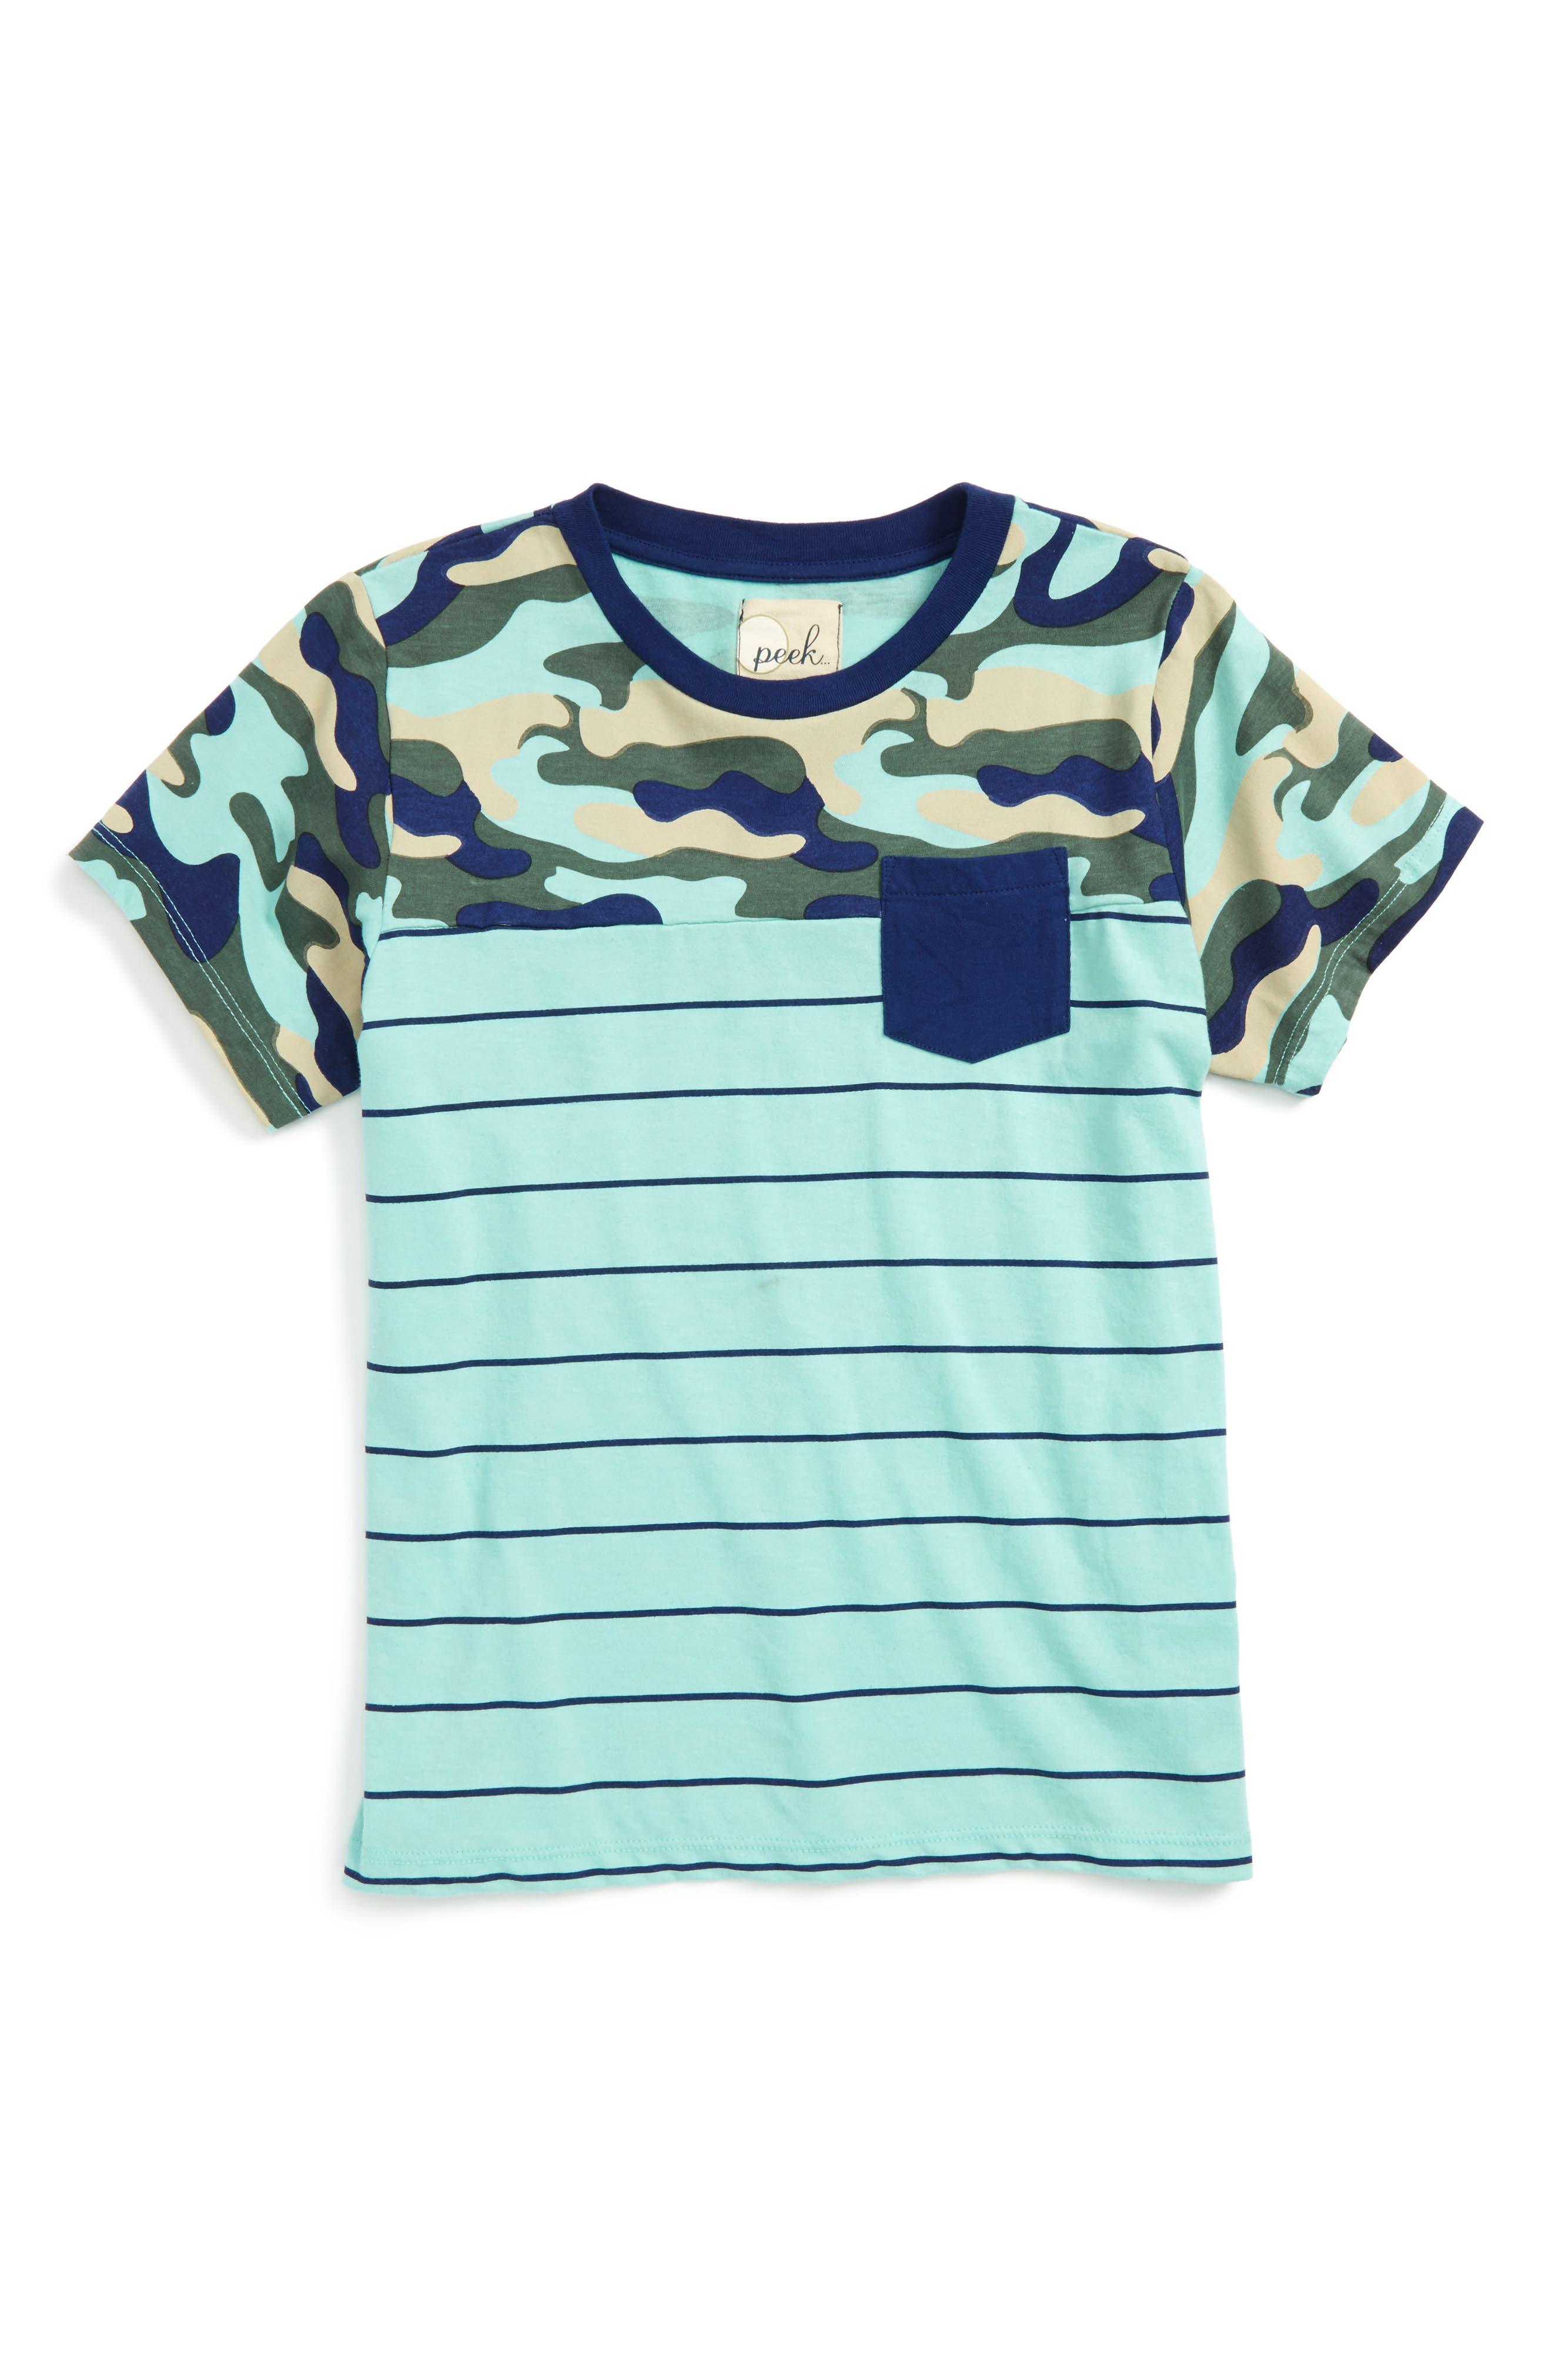 Brett Camo Pocket T-Shirt,                             Main thumbnail 1, color,                             443